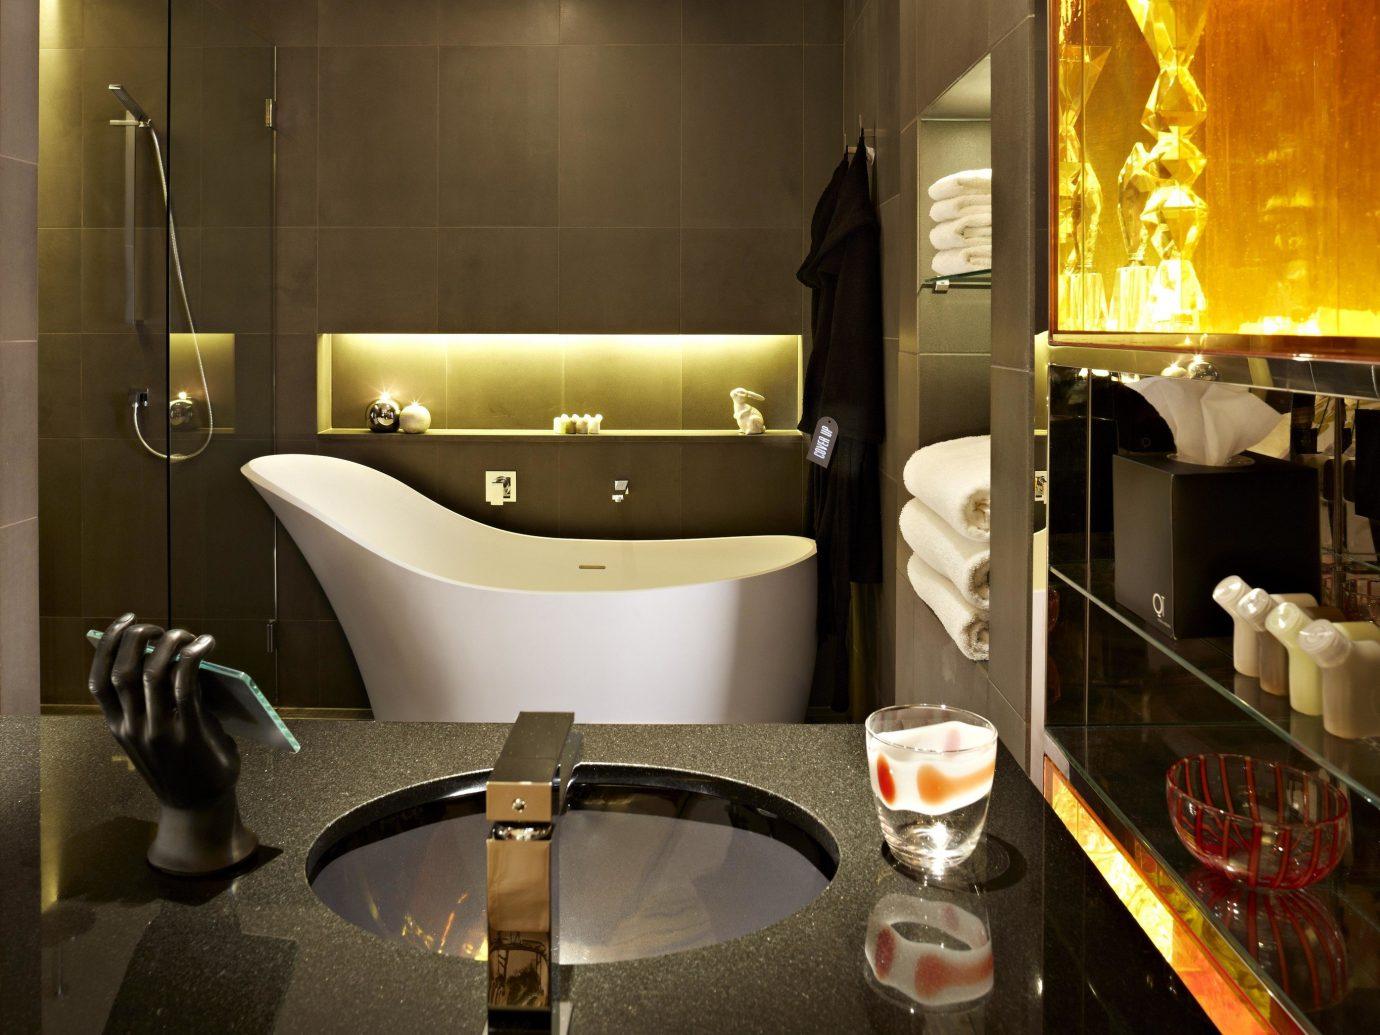 All-Inclusive Resorts Boutique Hotels Hotels Romance indoor wall room sink interior design lighting Suite Design towel